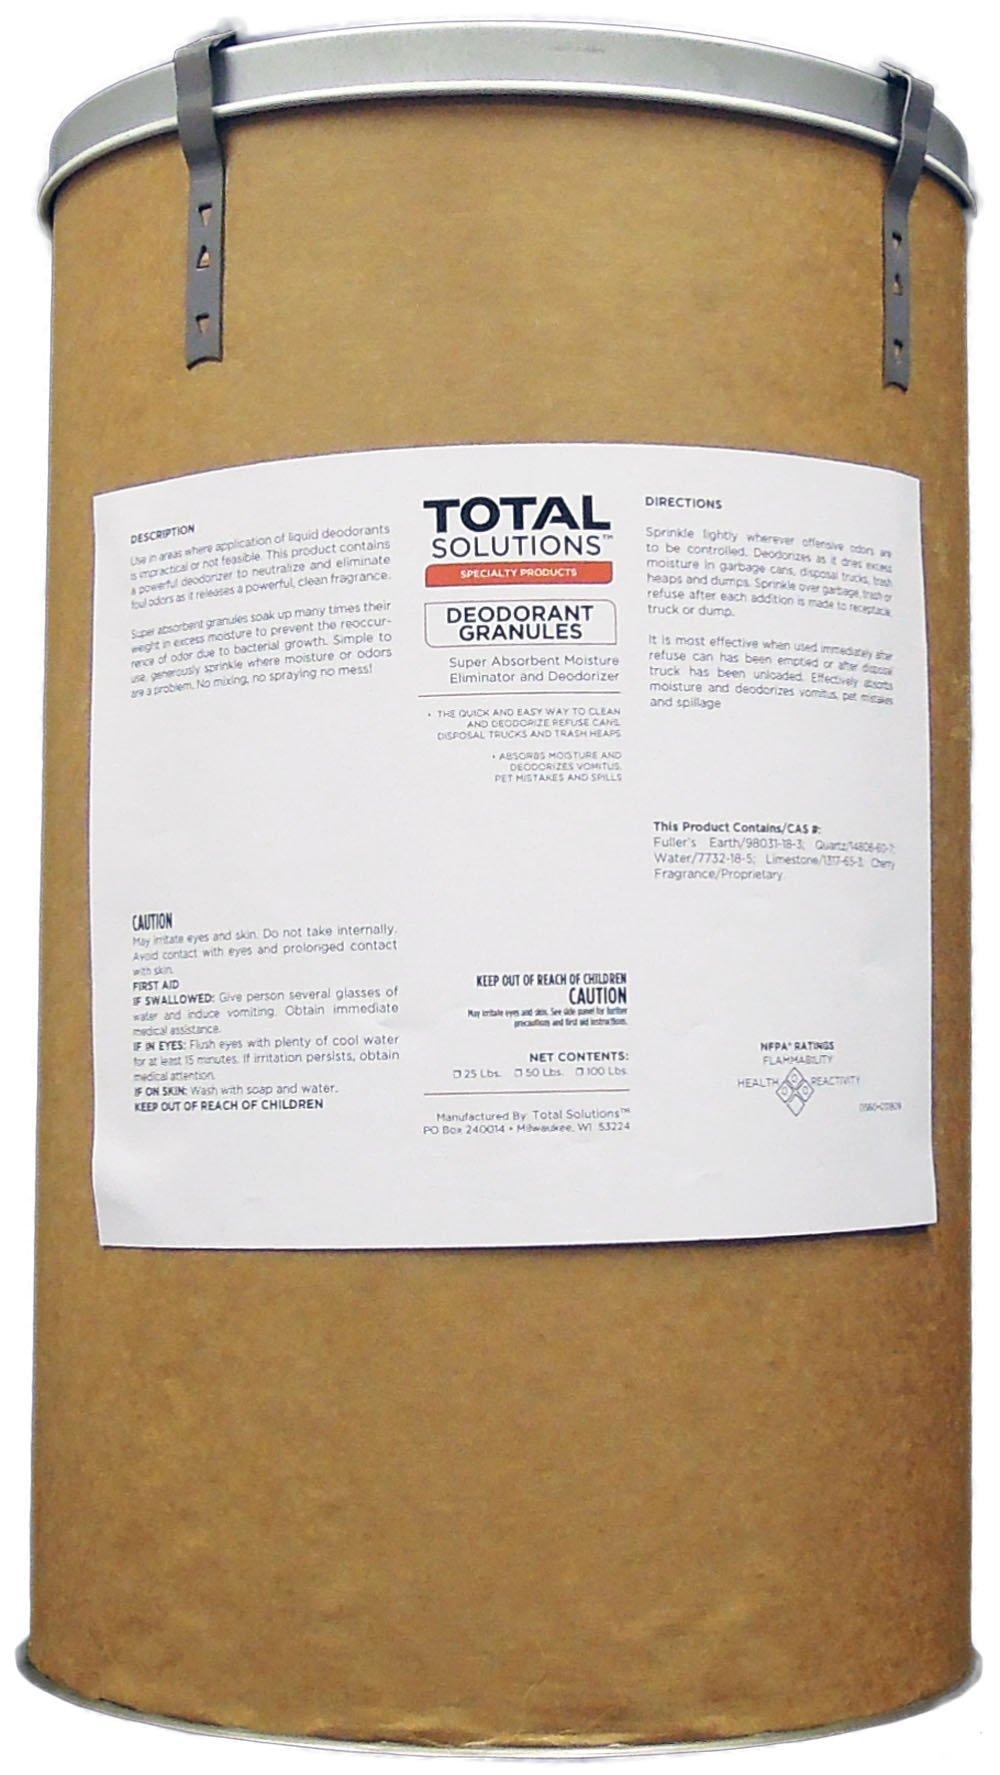 DEODORANT GRANULES   Super Absorbent Moisture Eliminator and Deodorizer (25 lbs)